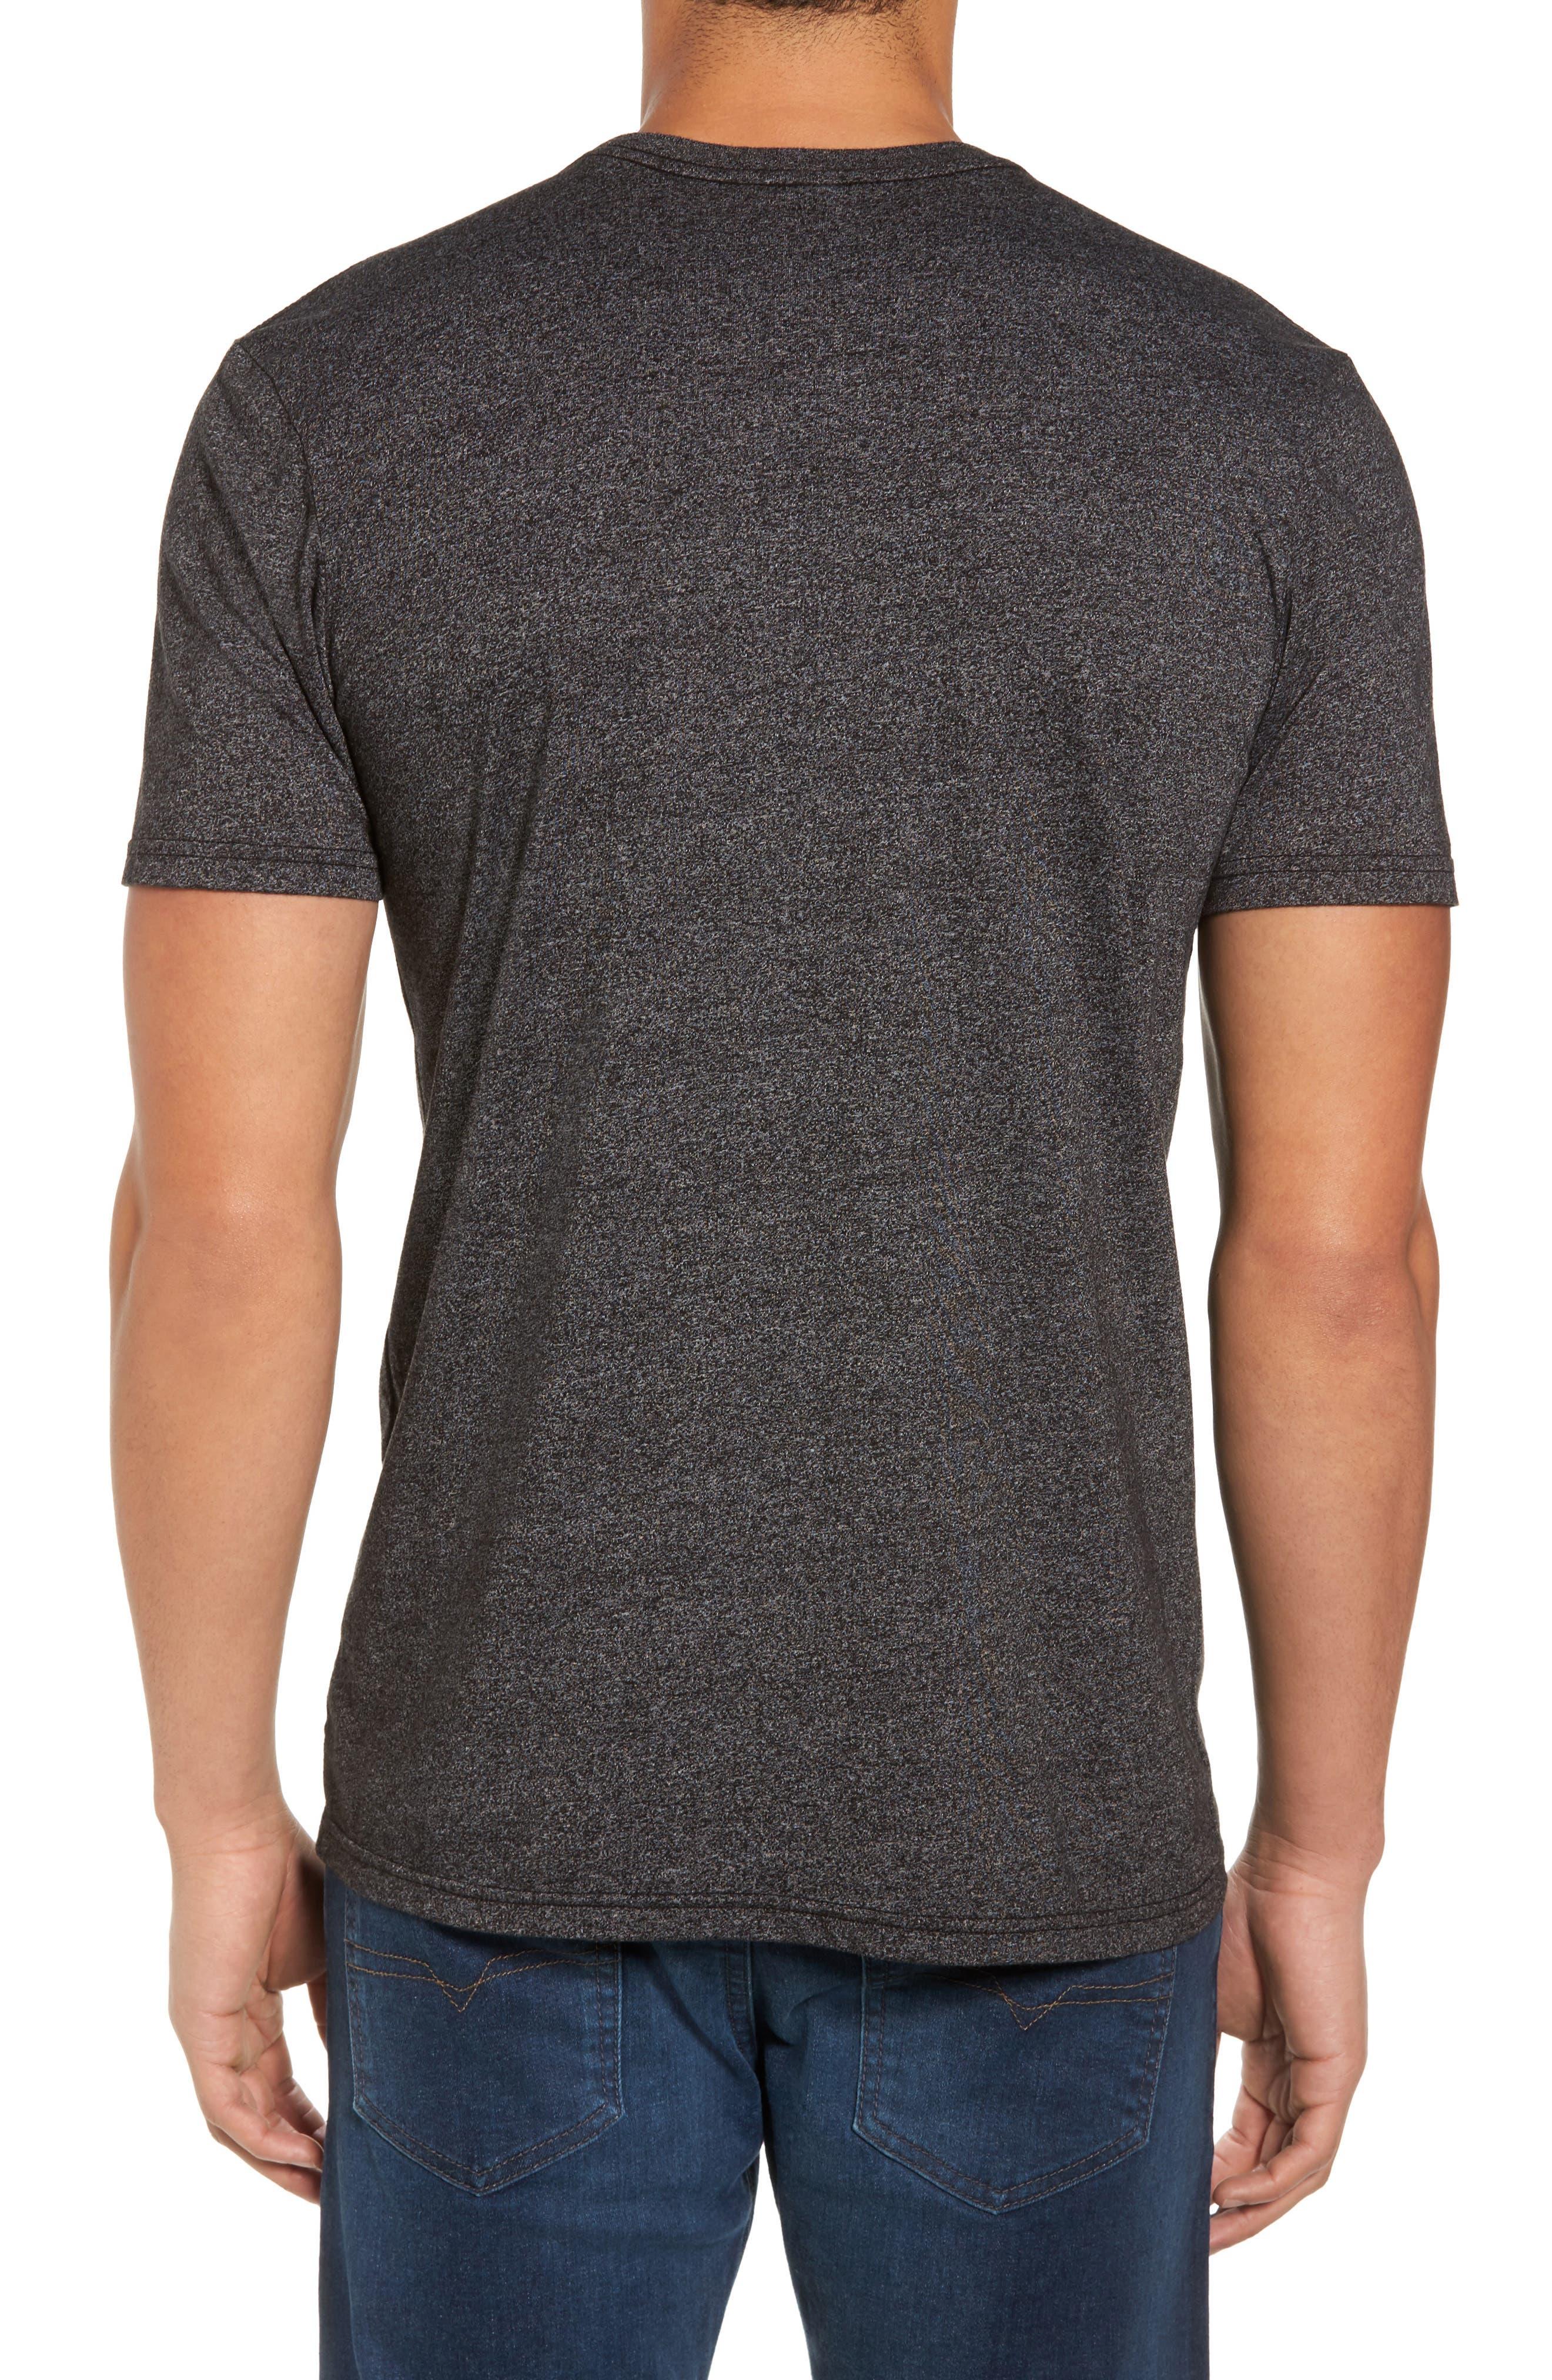 Winky's Crewneck T-Shirt,                             Alternate thumbnail 2, color,                             007